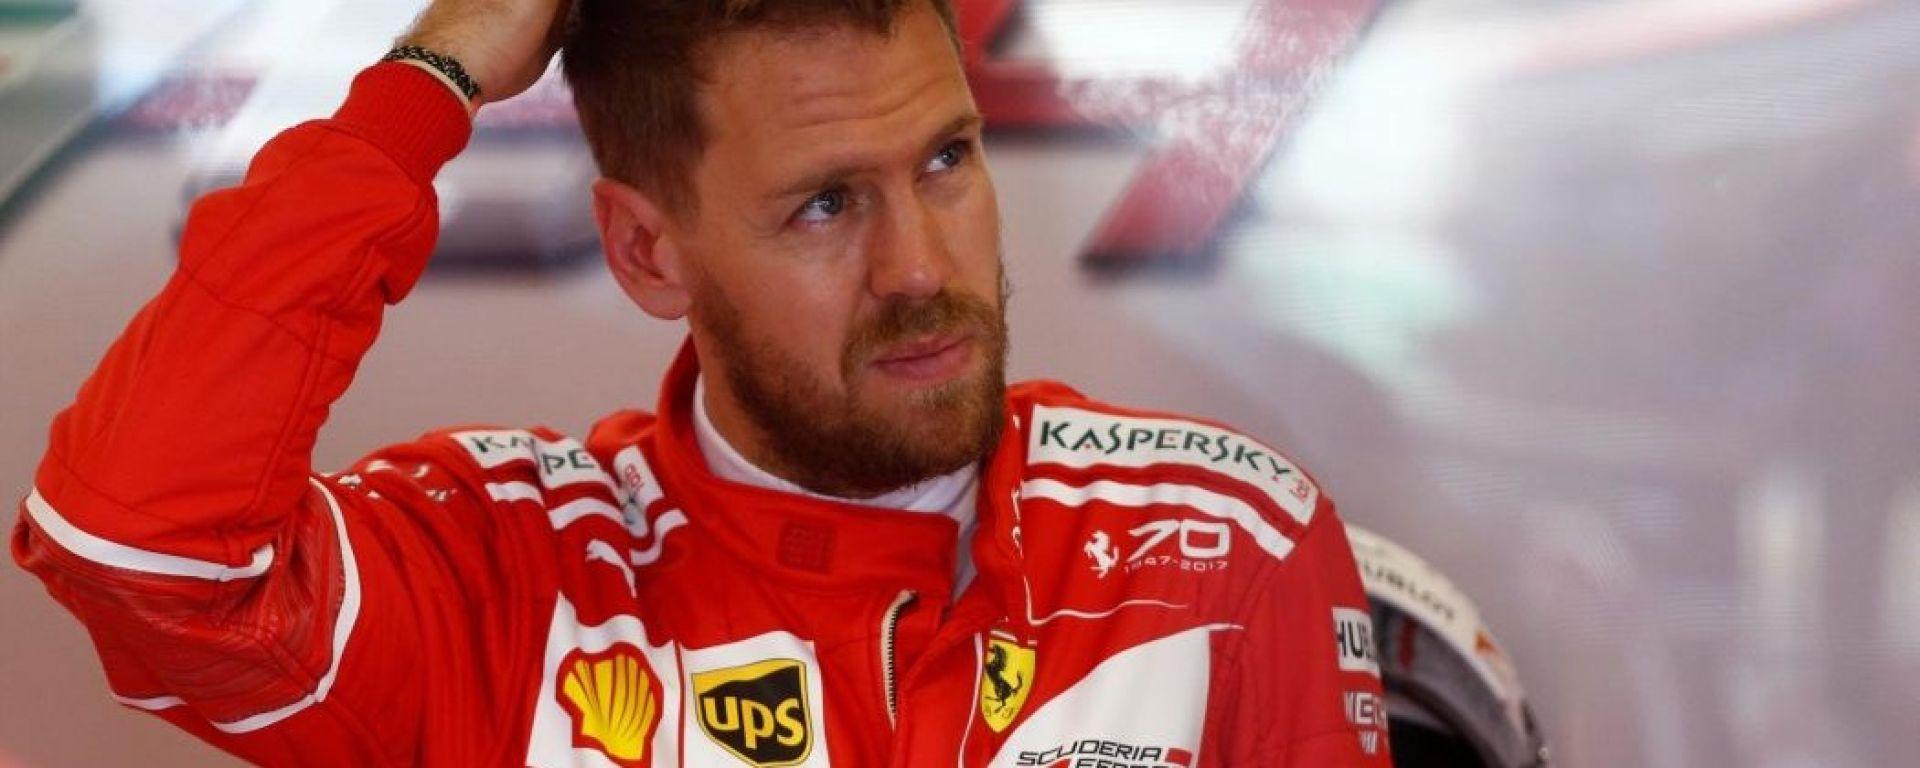 F1 2017 GP Austria, Sebastian Vettel